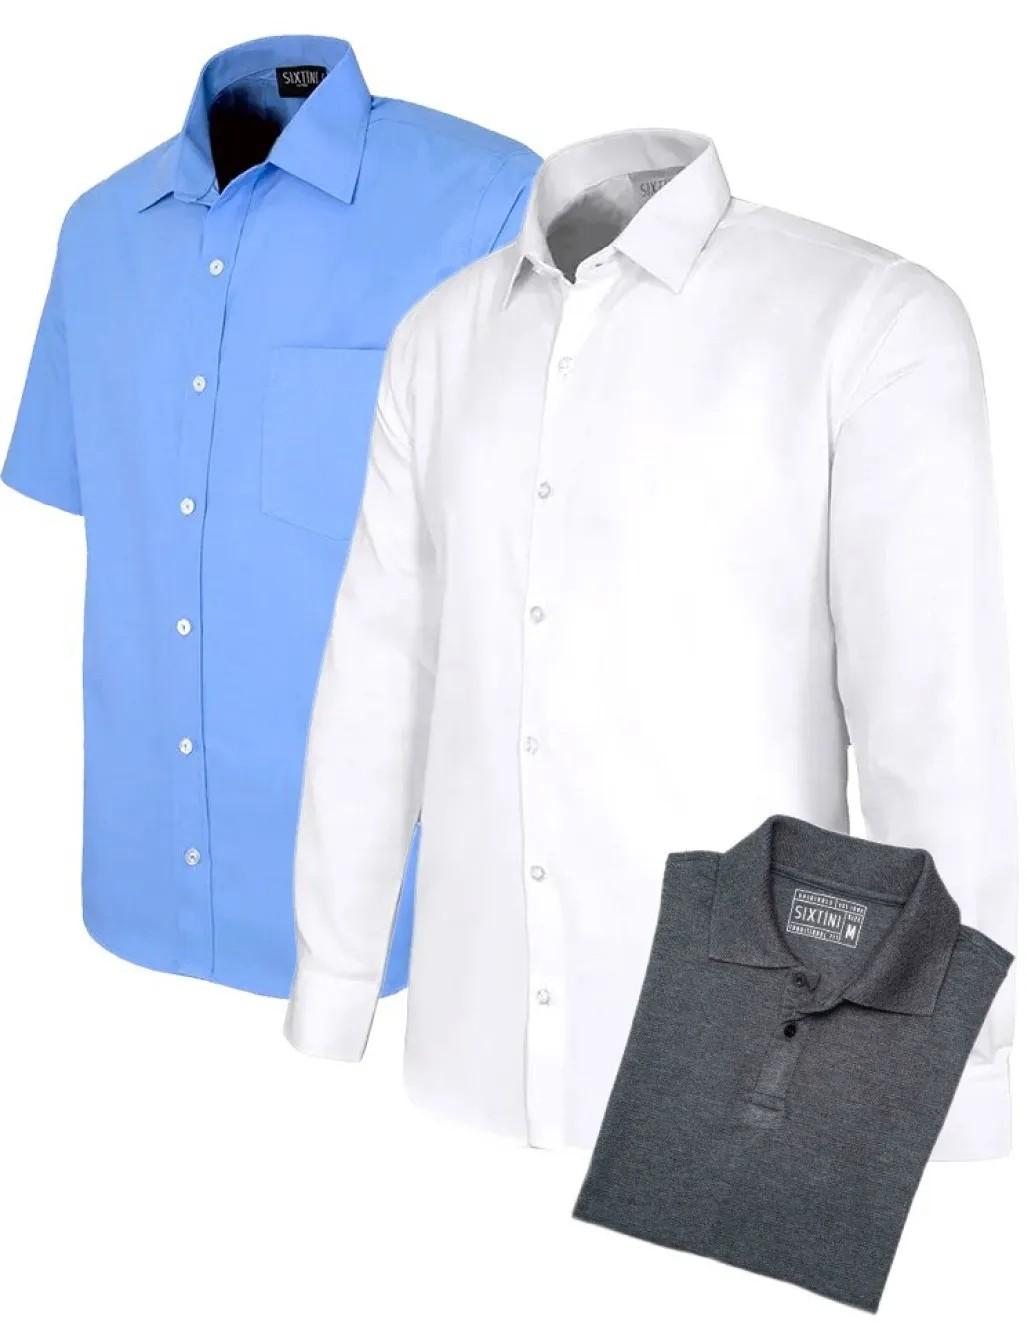 Kit camisa manga longa, camisa manga curta e camiseta polo